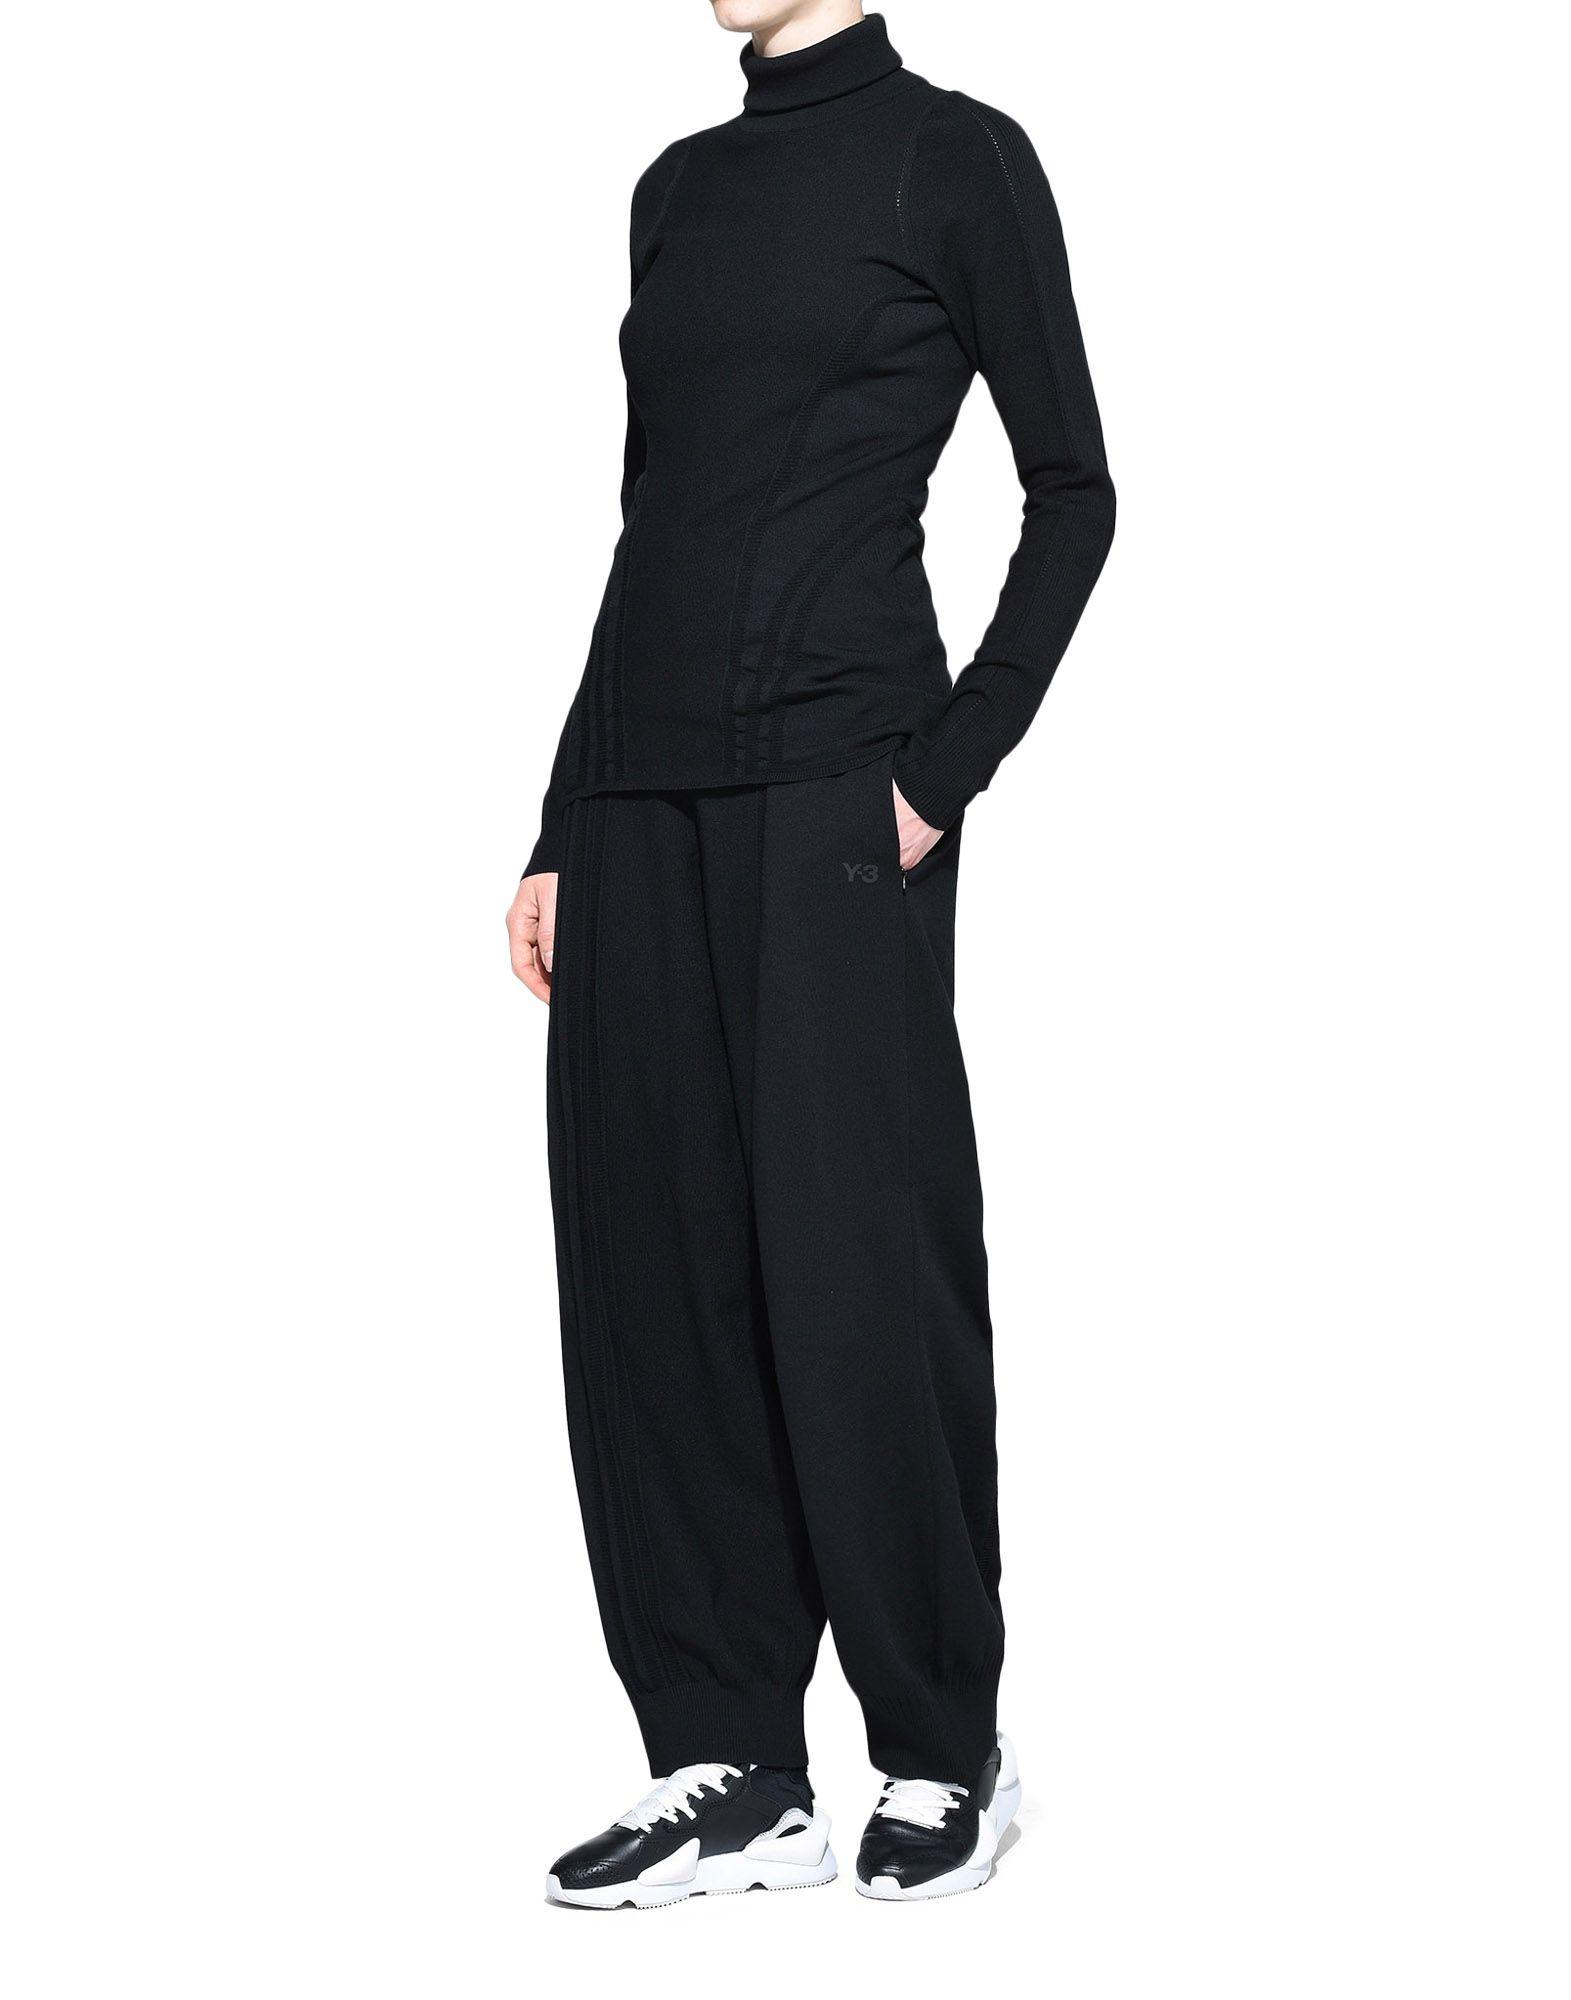 Y-3 Y-3 Tech Wool High Neck Tee Long sleeve t-shirt Woman a